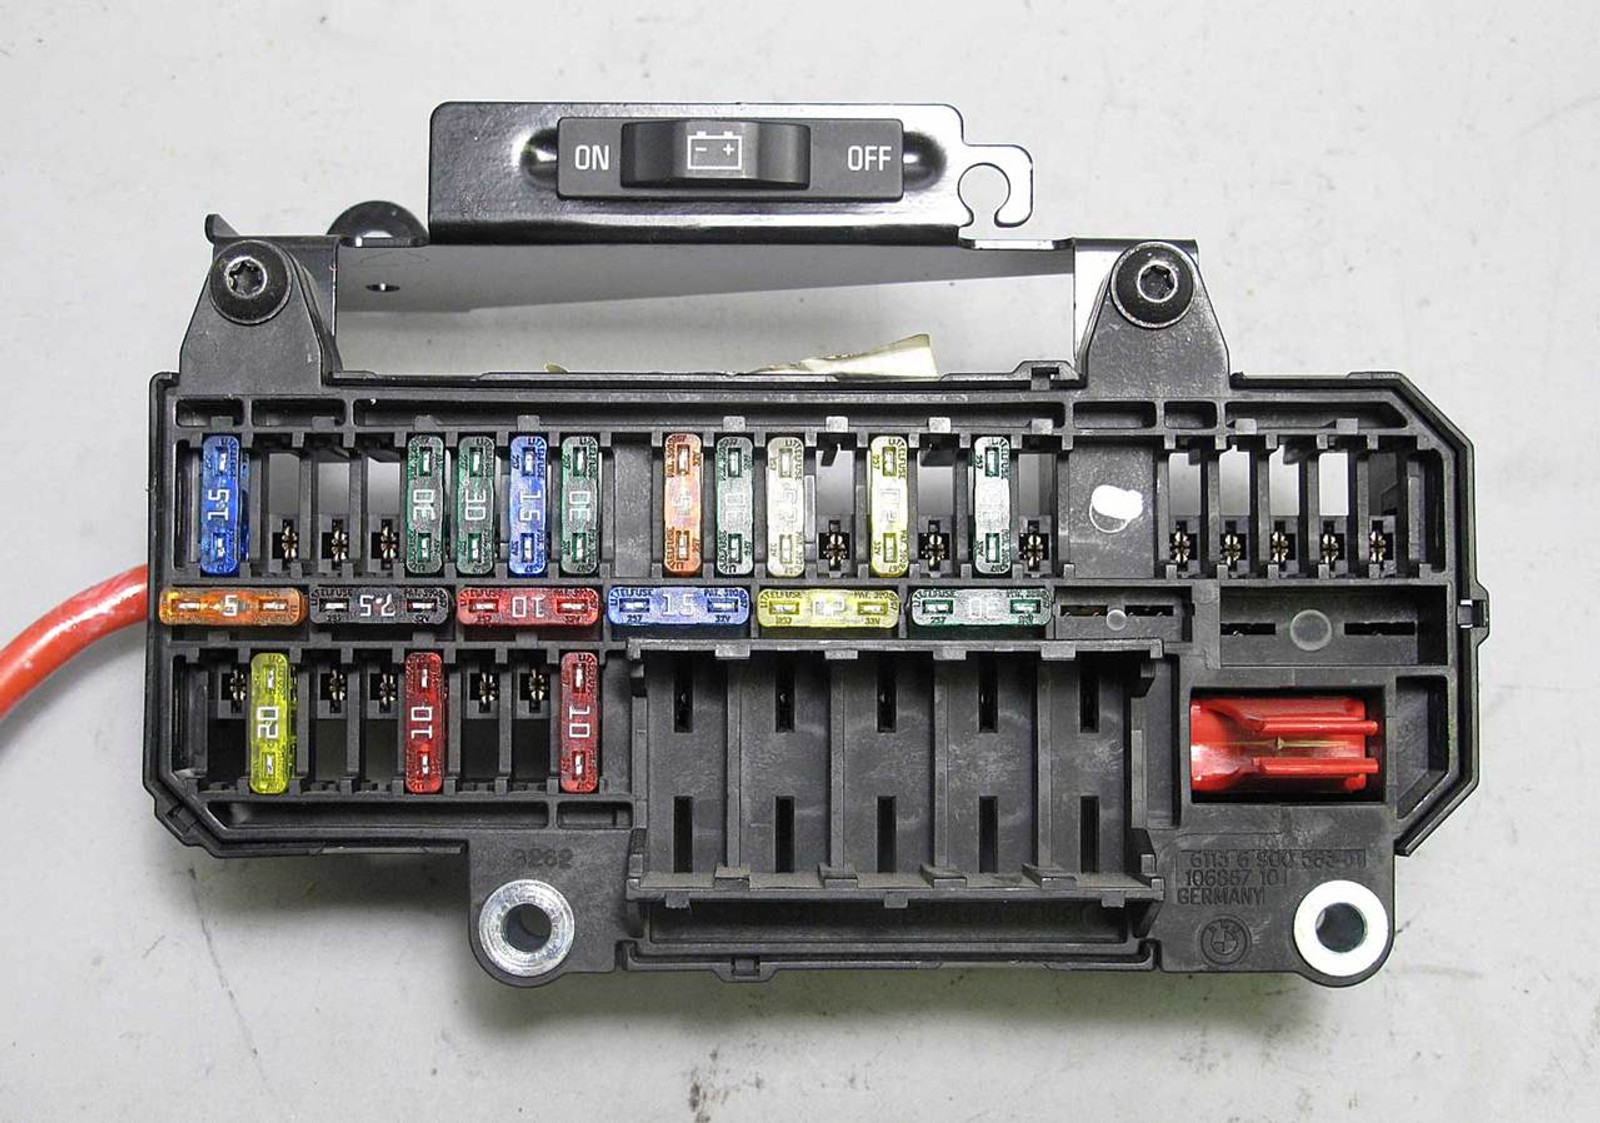 2002 bmw 7 series fuse box